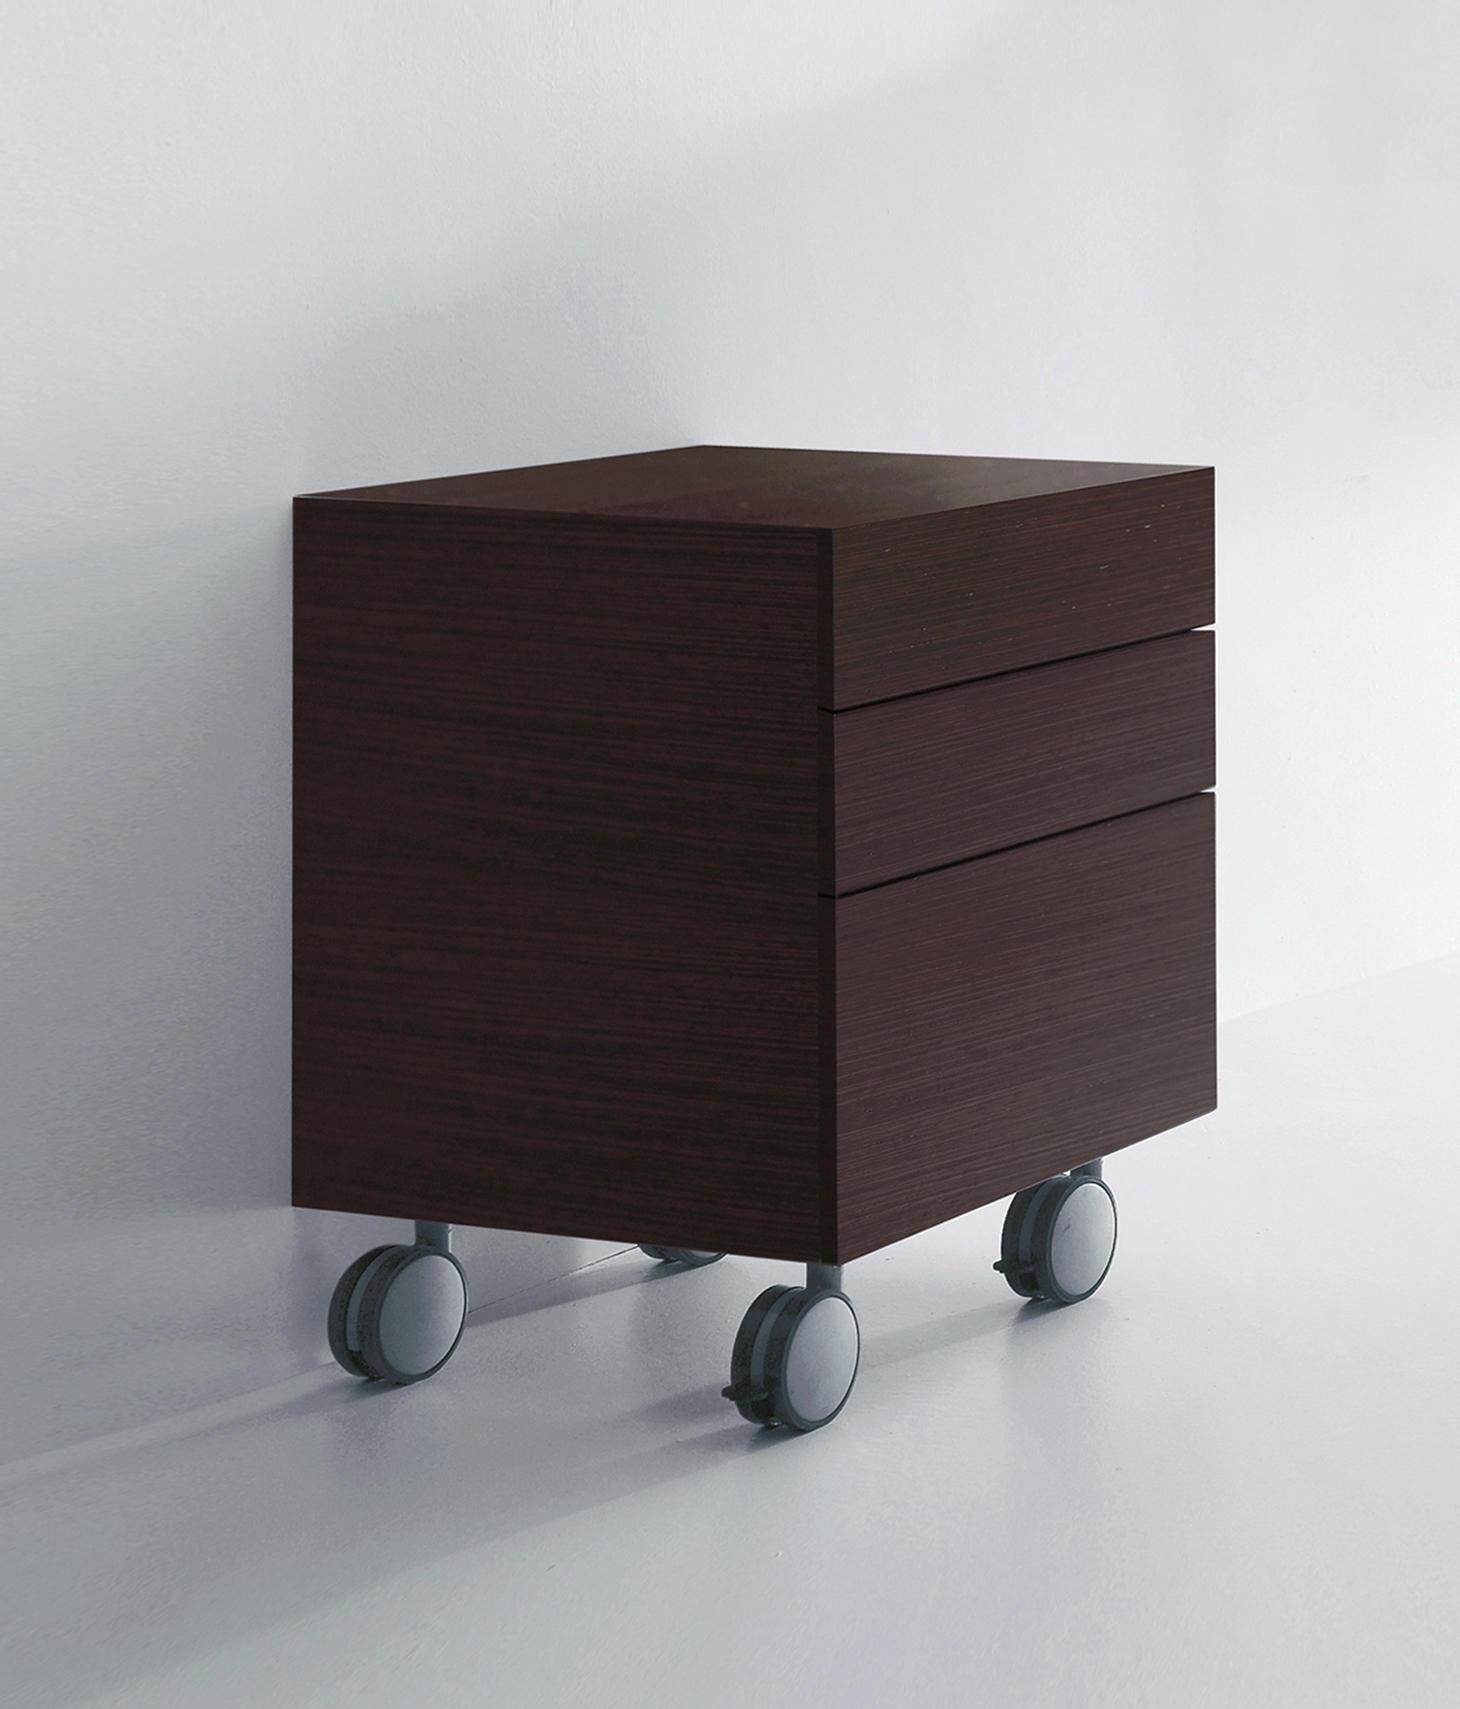 Units cassettiera 3 cassetti weng contenitori bagno kerasan architonic - Cassettiera bagno ...